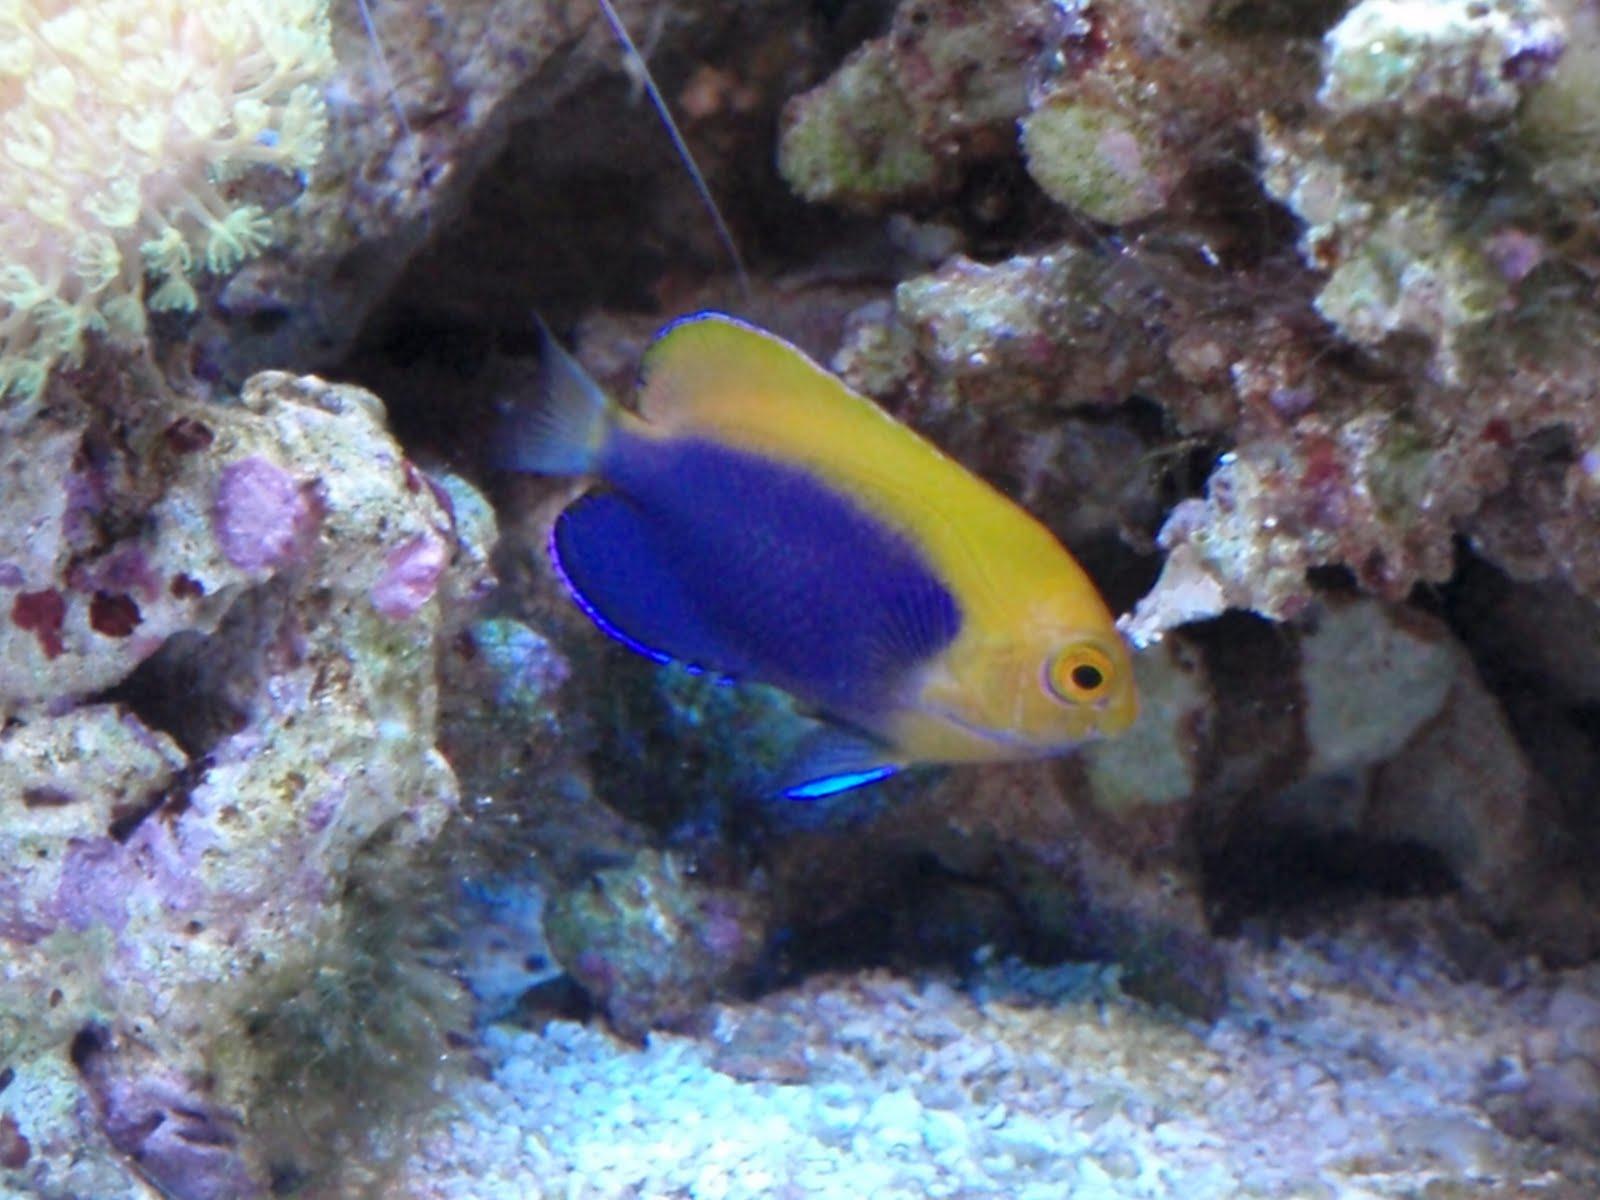 ... and Tribulations of a Reef Aquarium: African Flameback Dwarf Angel